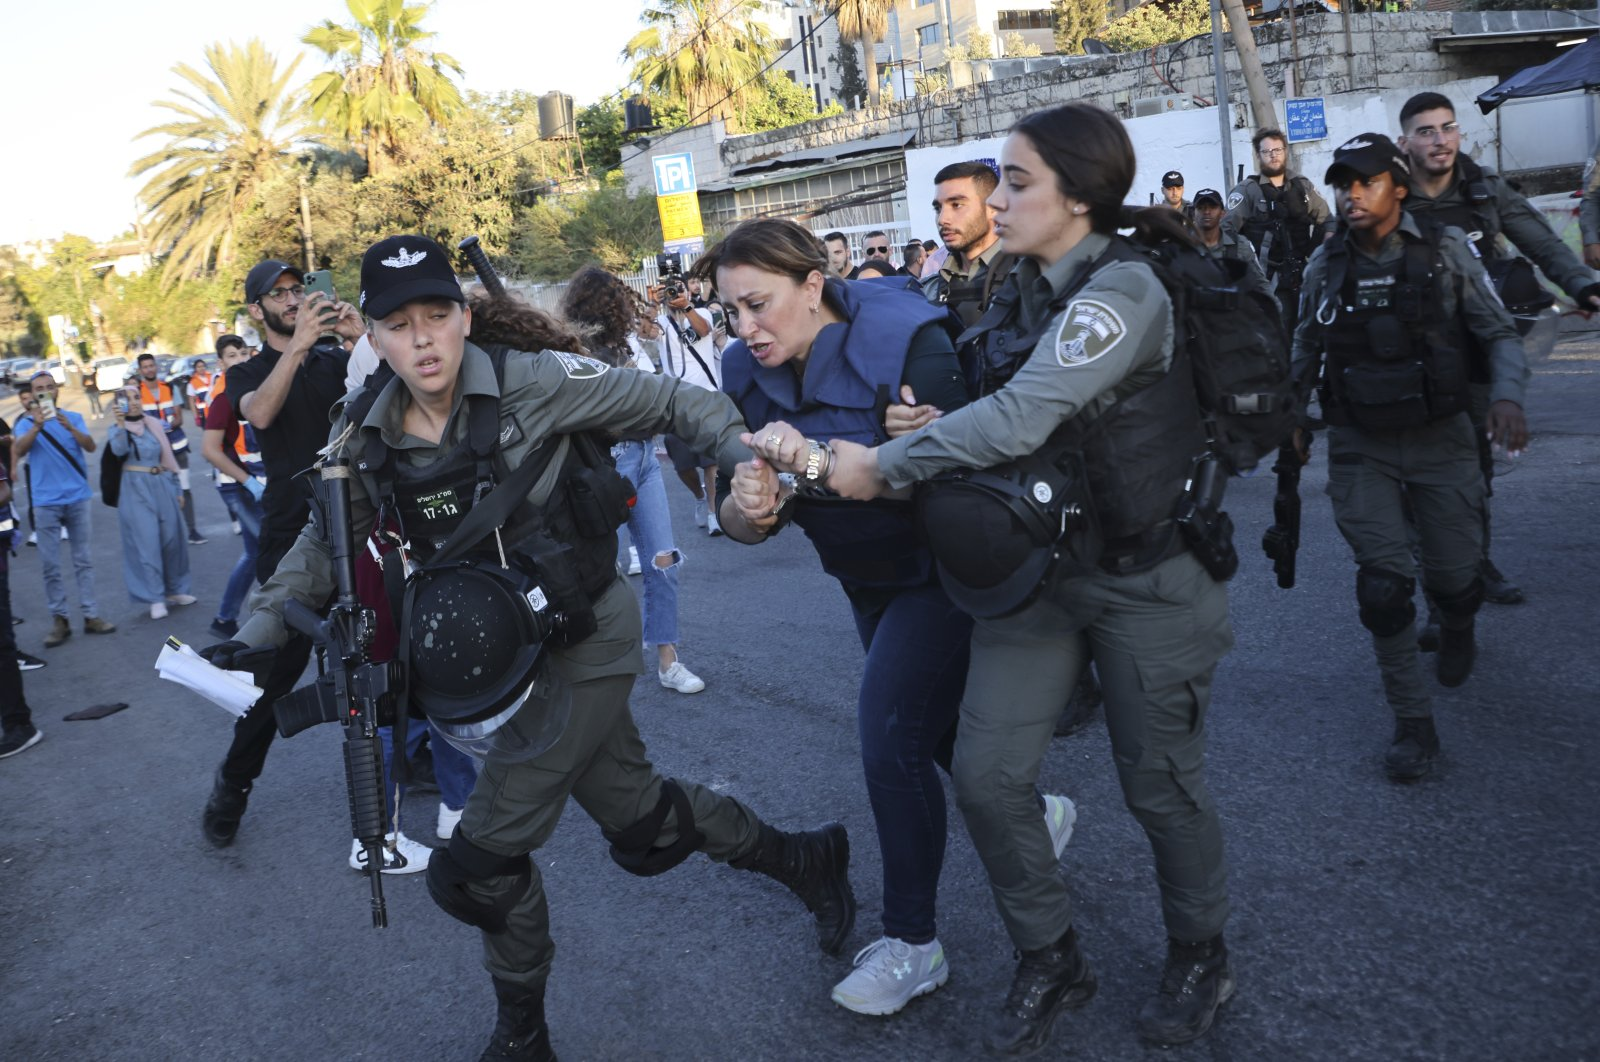 Israeli forces arrest Al Jazeera journalist, Givara Budeiri, during a protest in the Sheikh Jarrah neighborhood, in the Old City, East Jerusalem, occupied Palestine, June 5, 2021. (AP Photo)